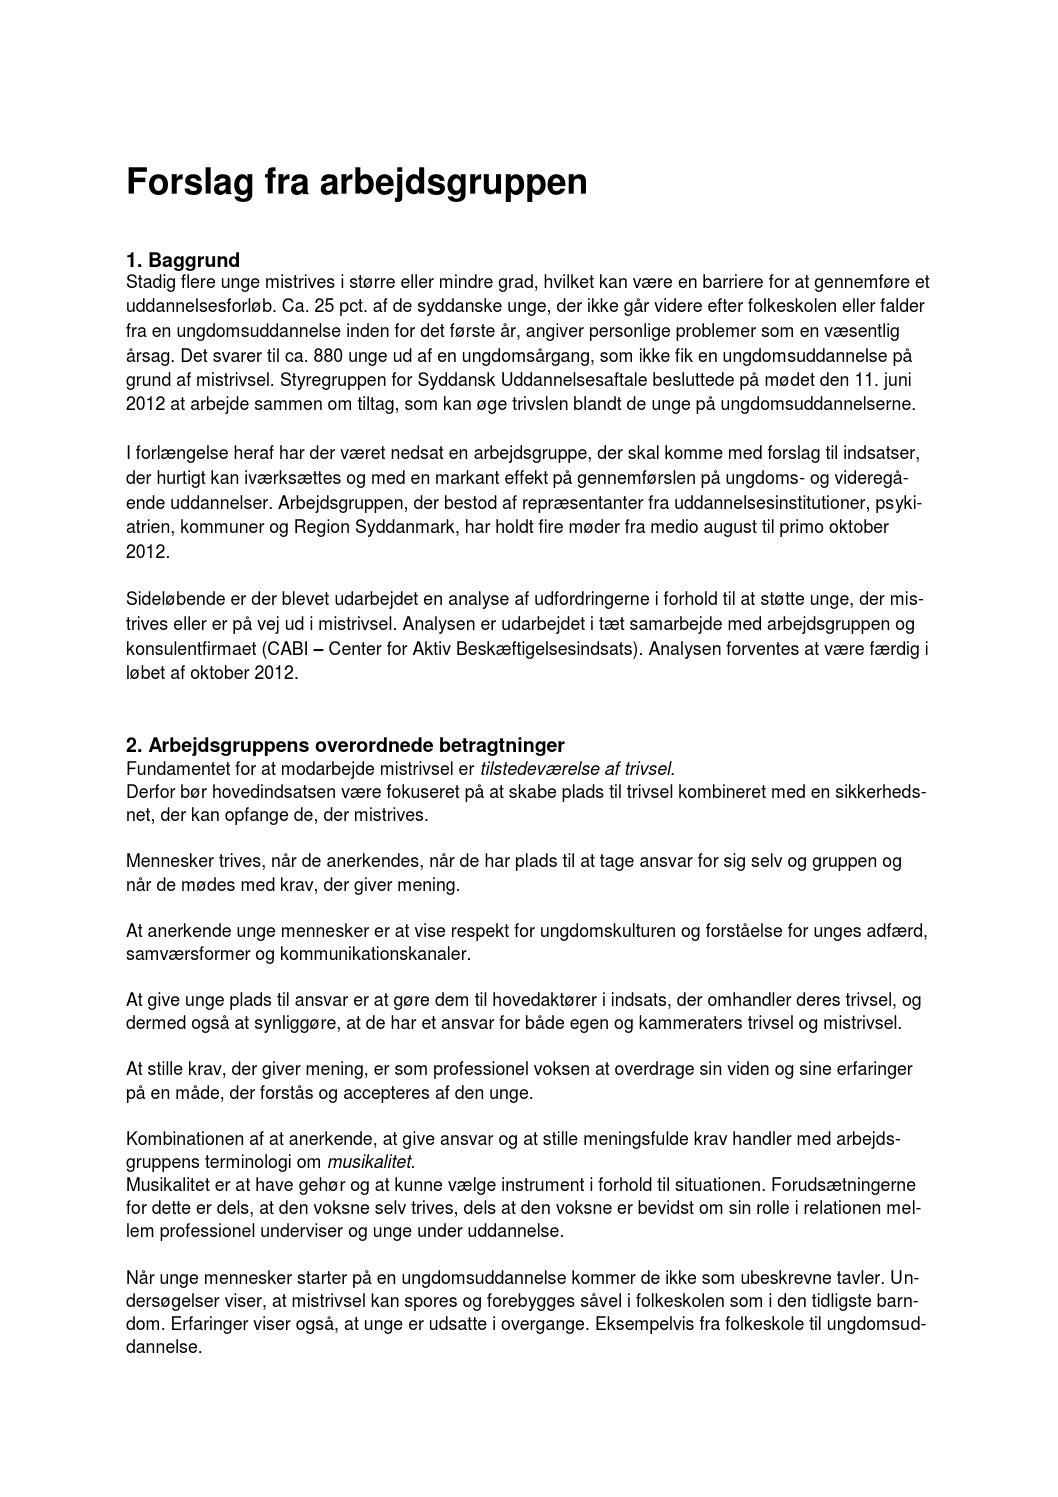 a77e7f0075e Arbejdsgruppens anbefalinger by Jonas Svane Jakobsen - issuu